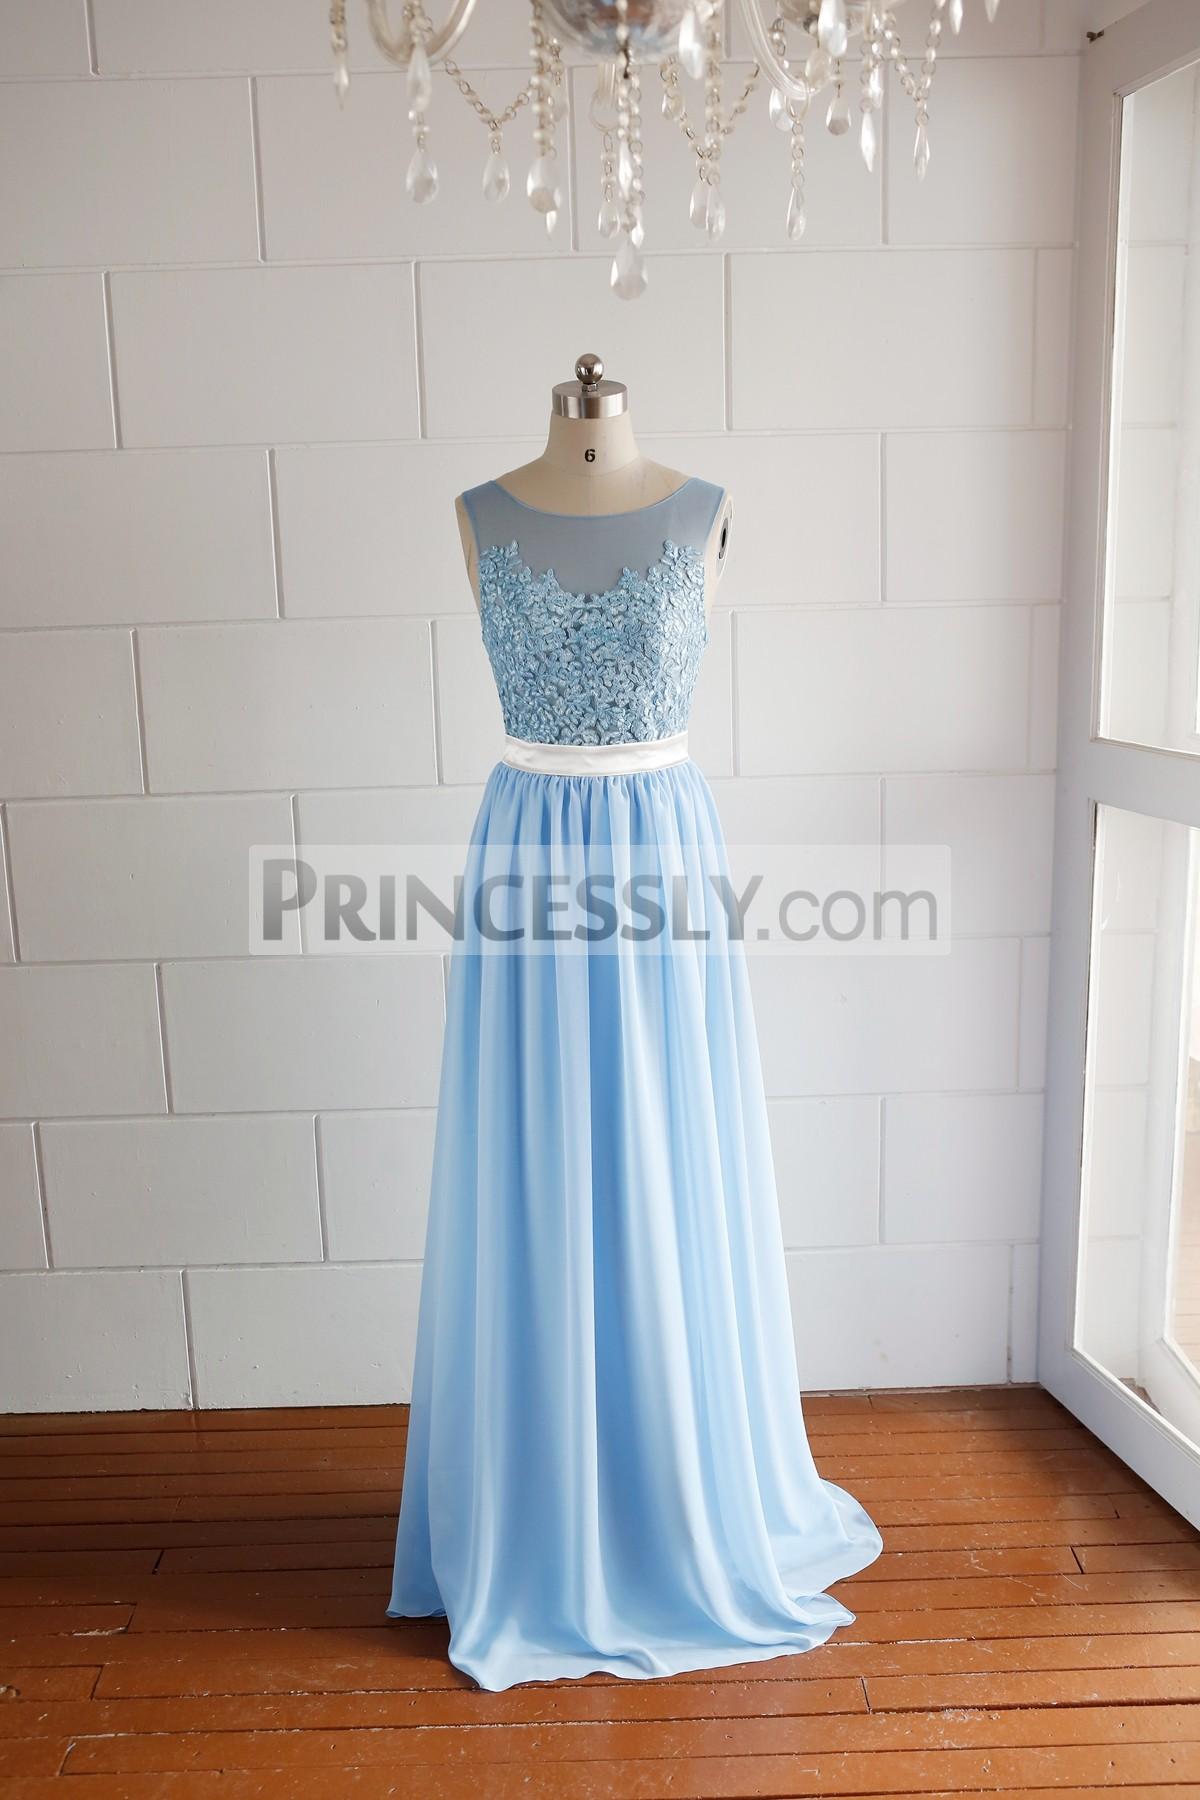 Princessly.com-K1000062-Illusion Neck Blue Lace Chiffon Prom Dress-31